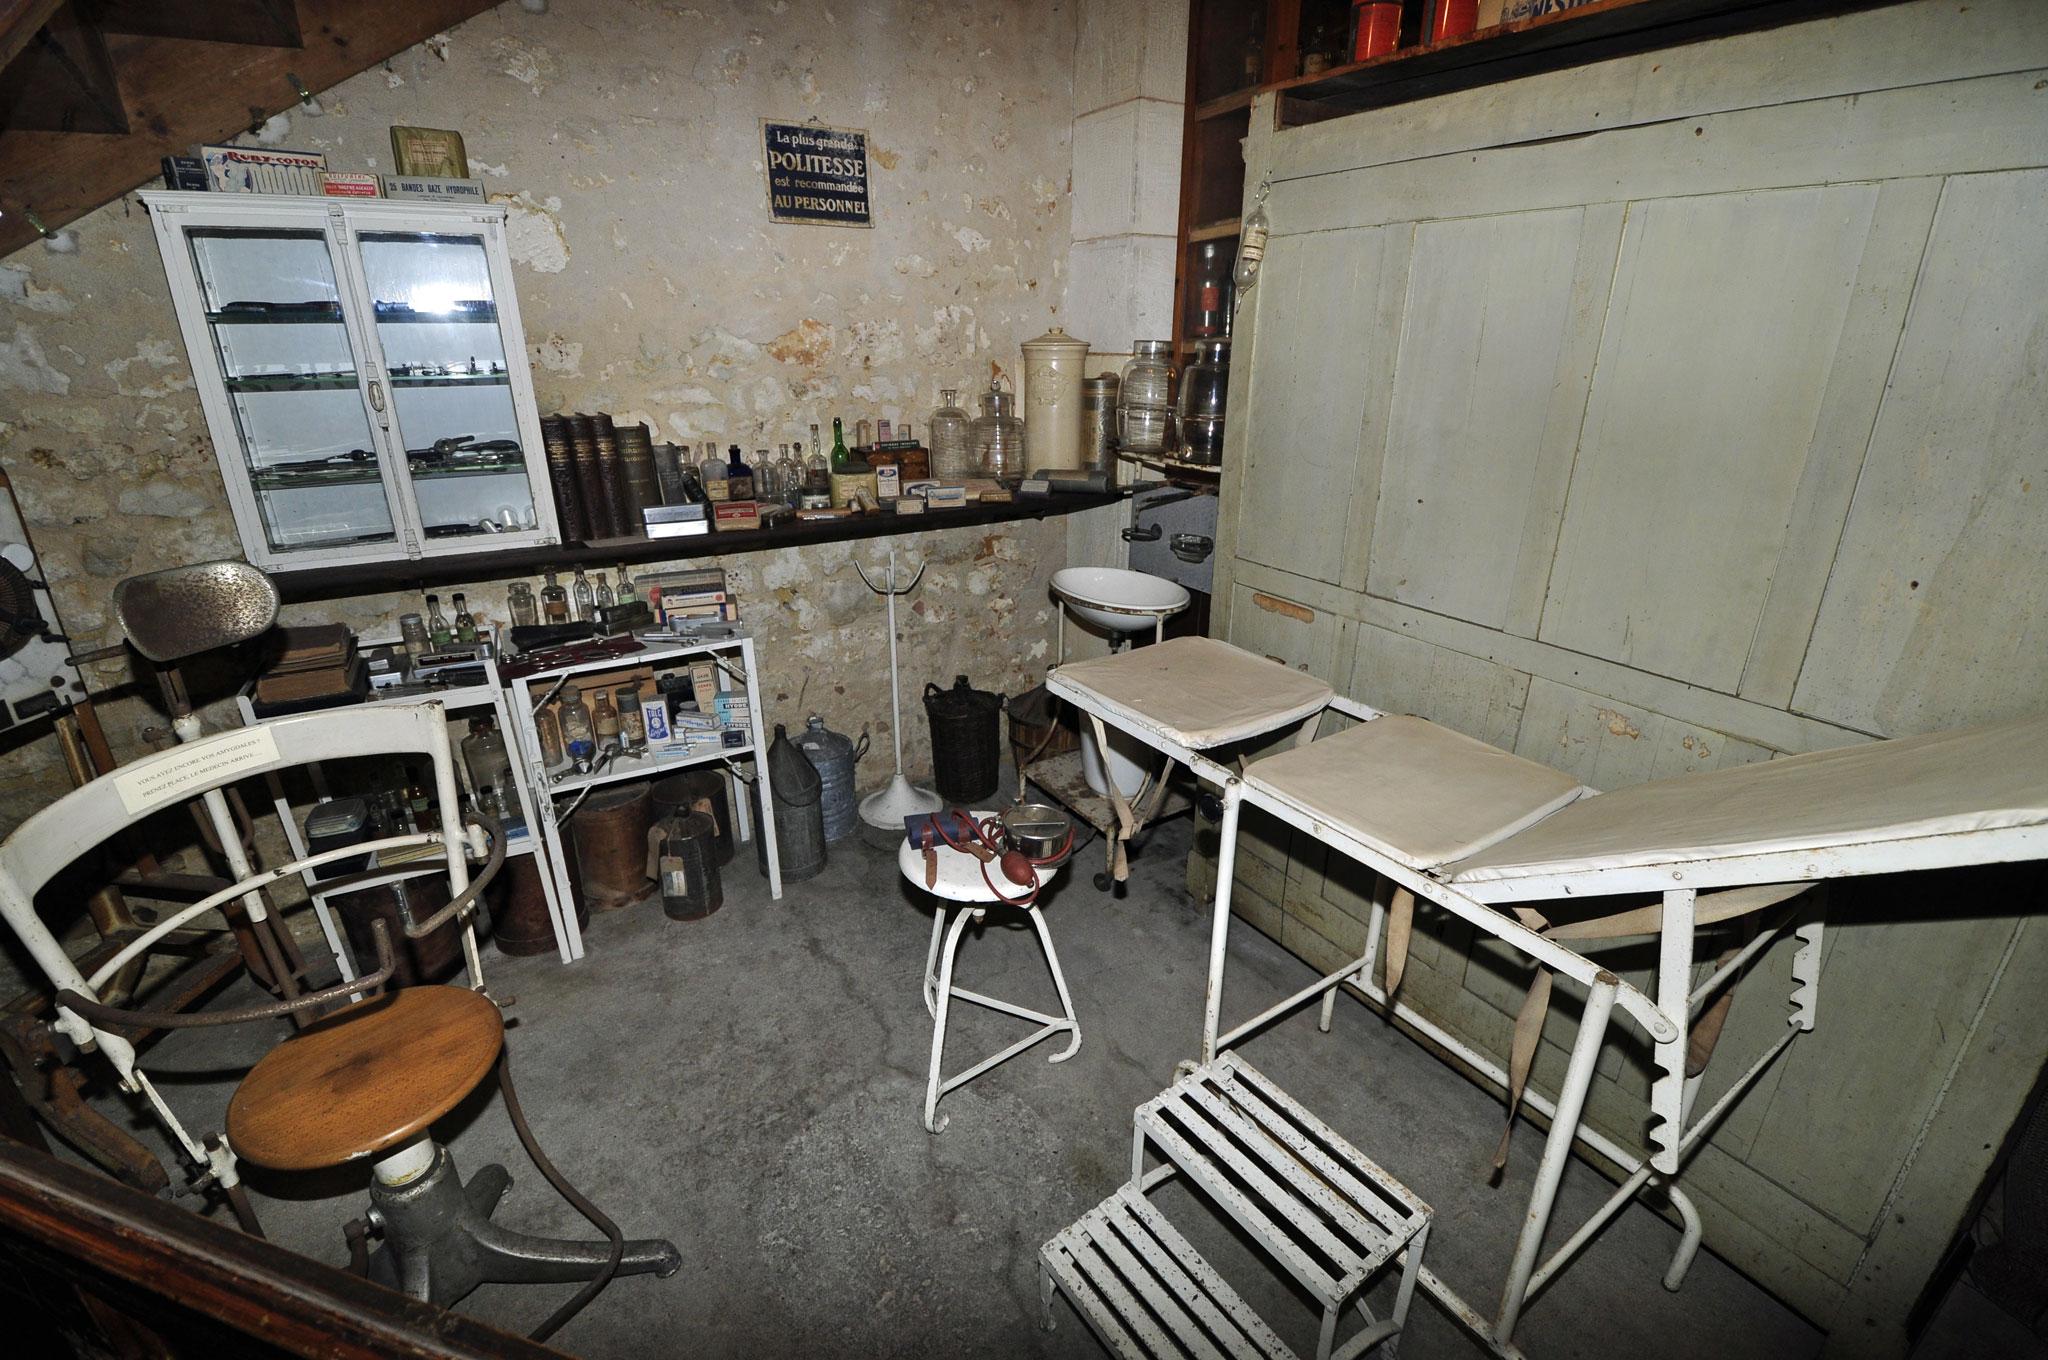 photo rochefort 17300 rochefort musee des commerces d 39 autrefois le cabinet medical 182236. Black Bedroom Furniture Sets. Home Design Ideas